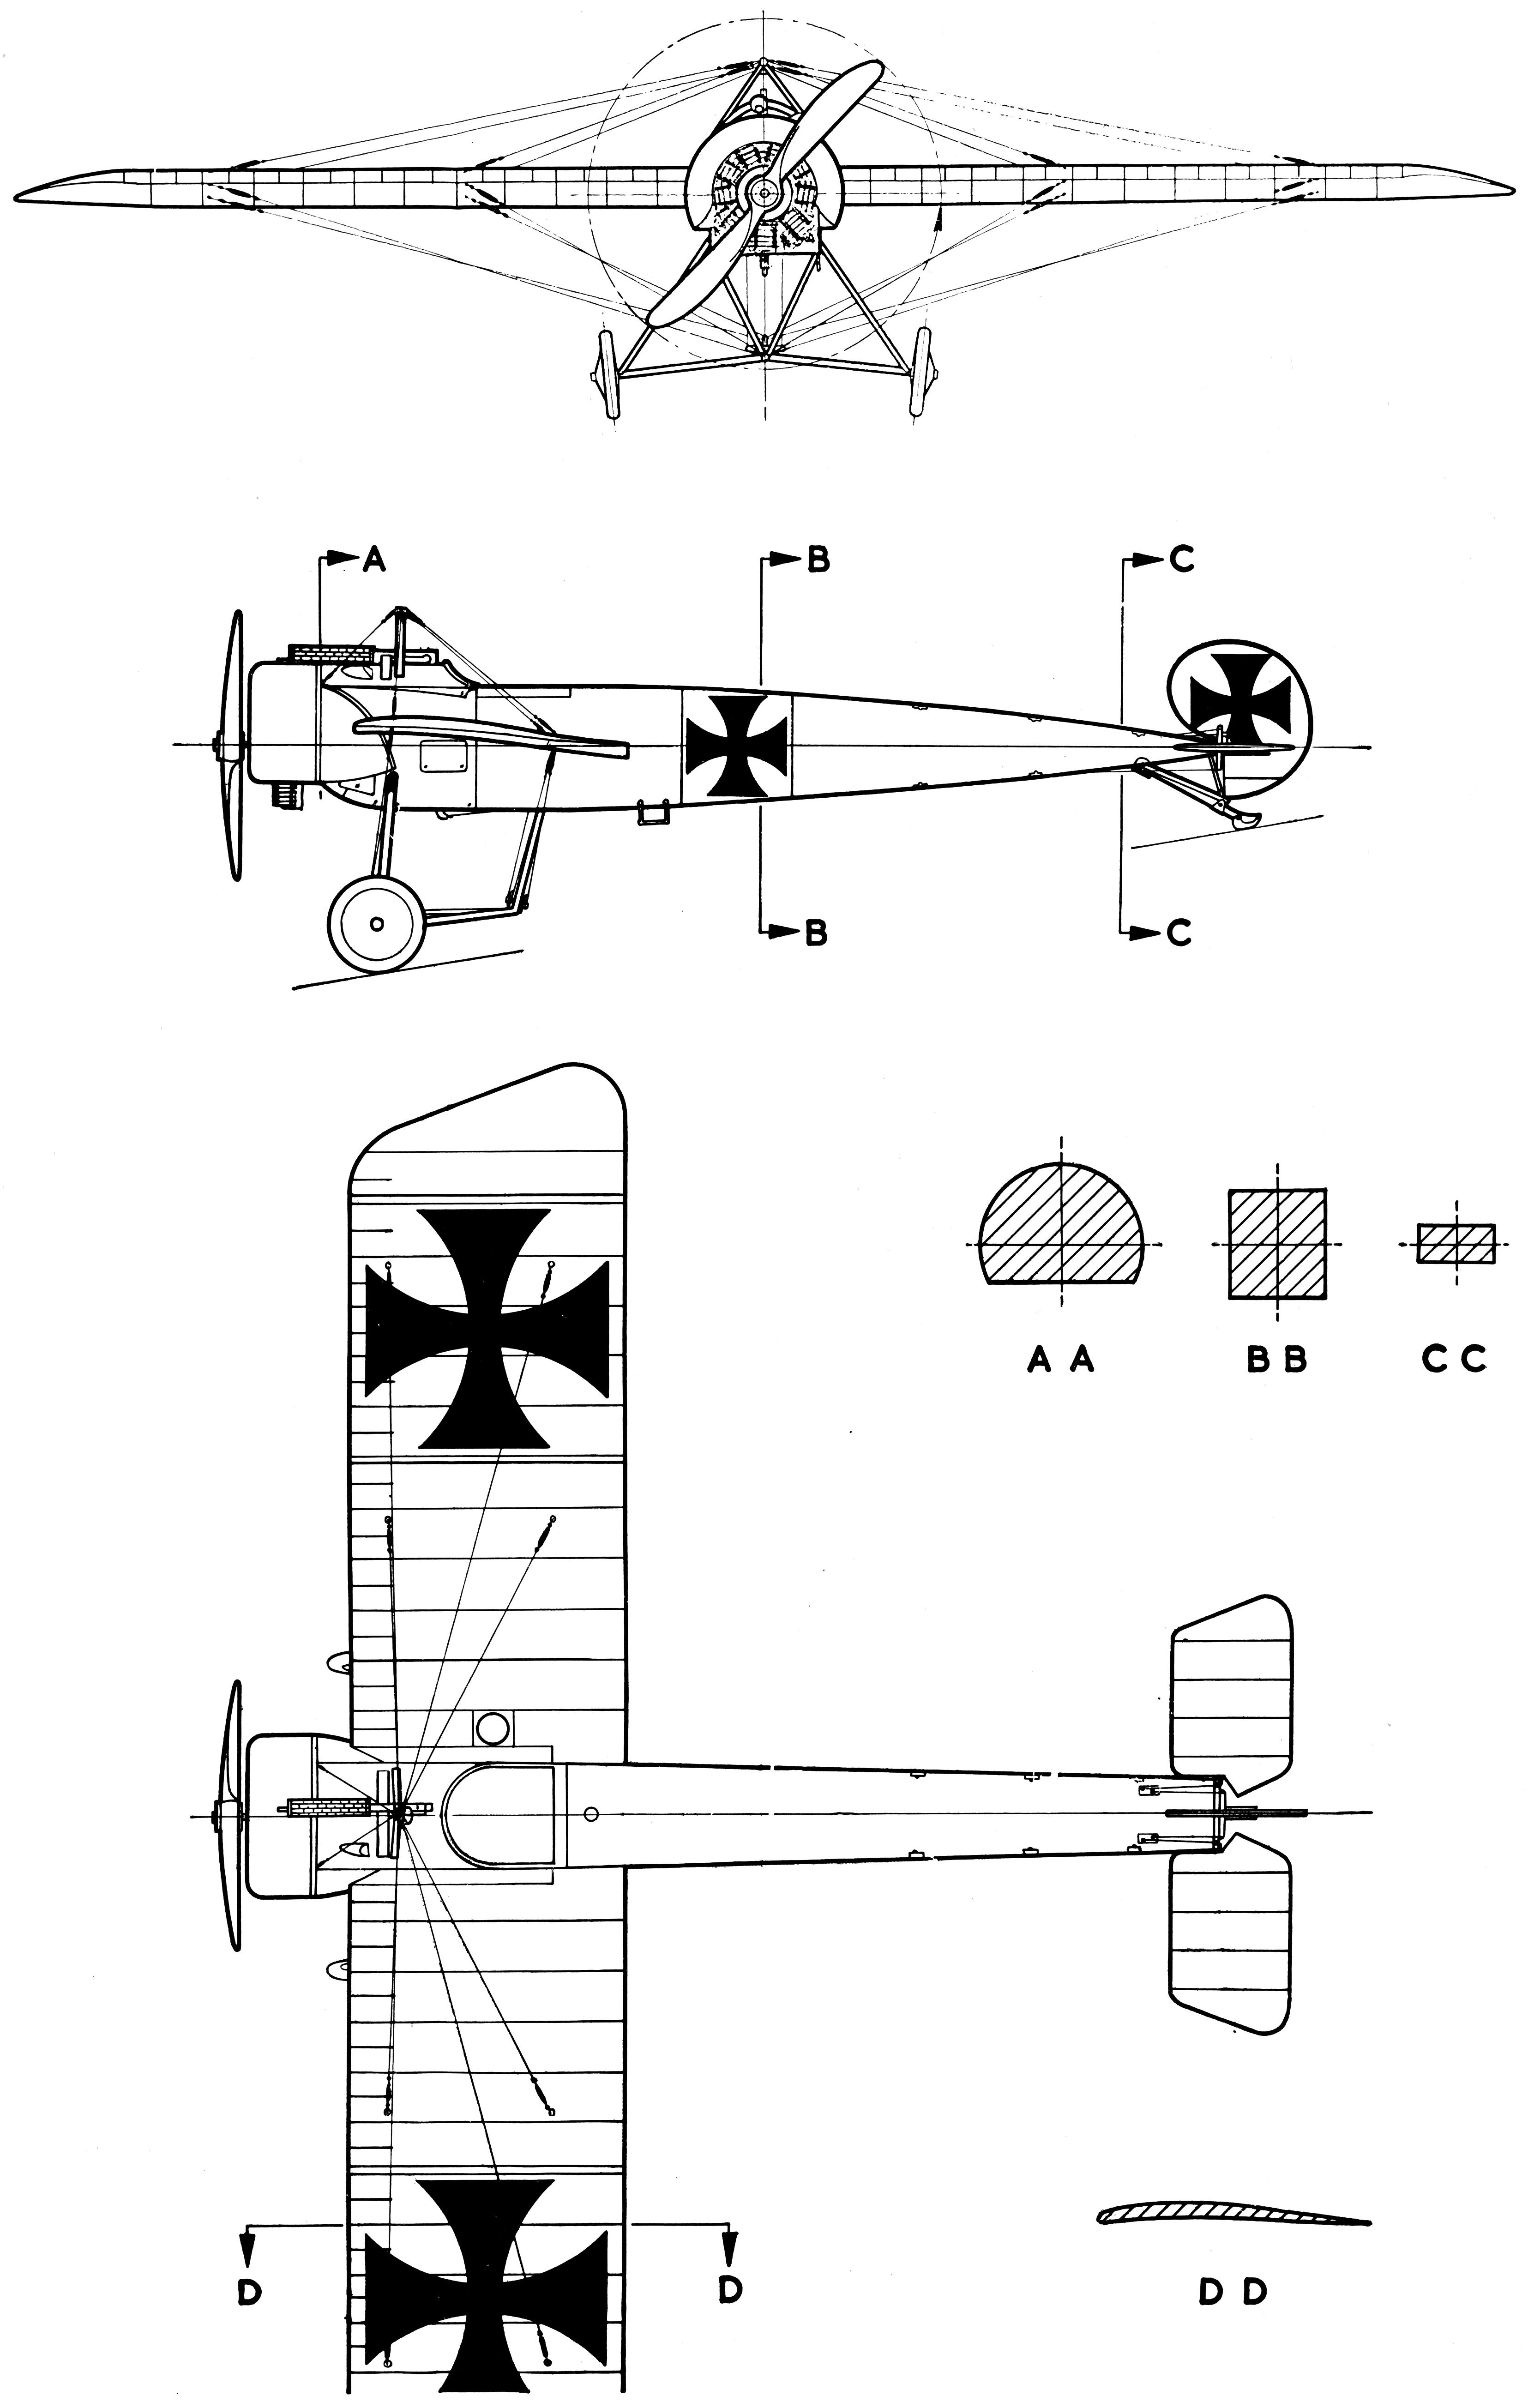 Fokker E III blueprint | Blueprints | Aircraft, Model